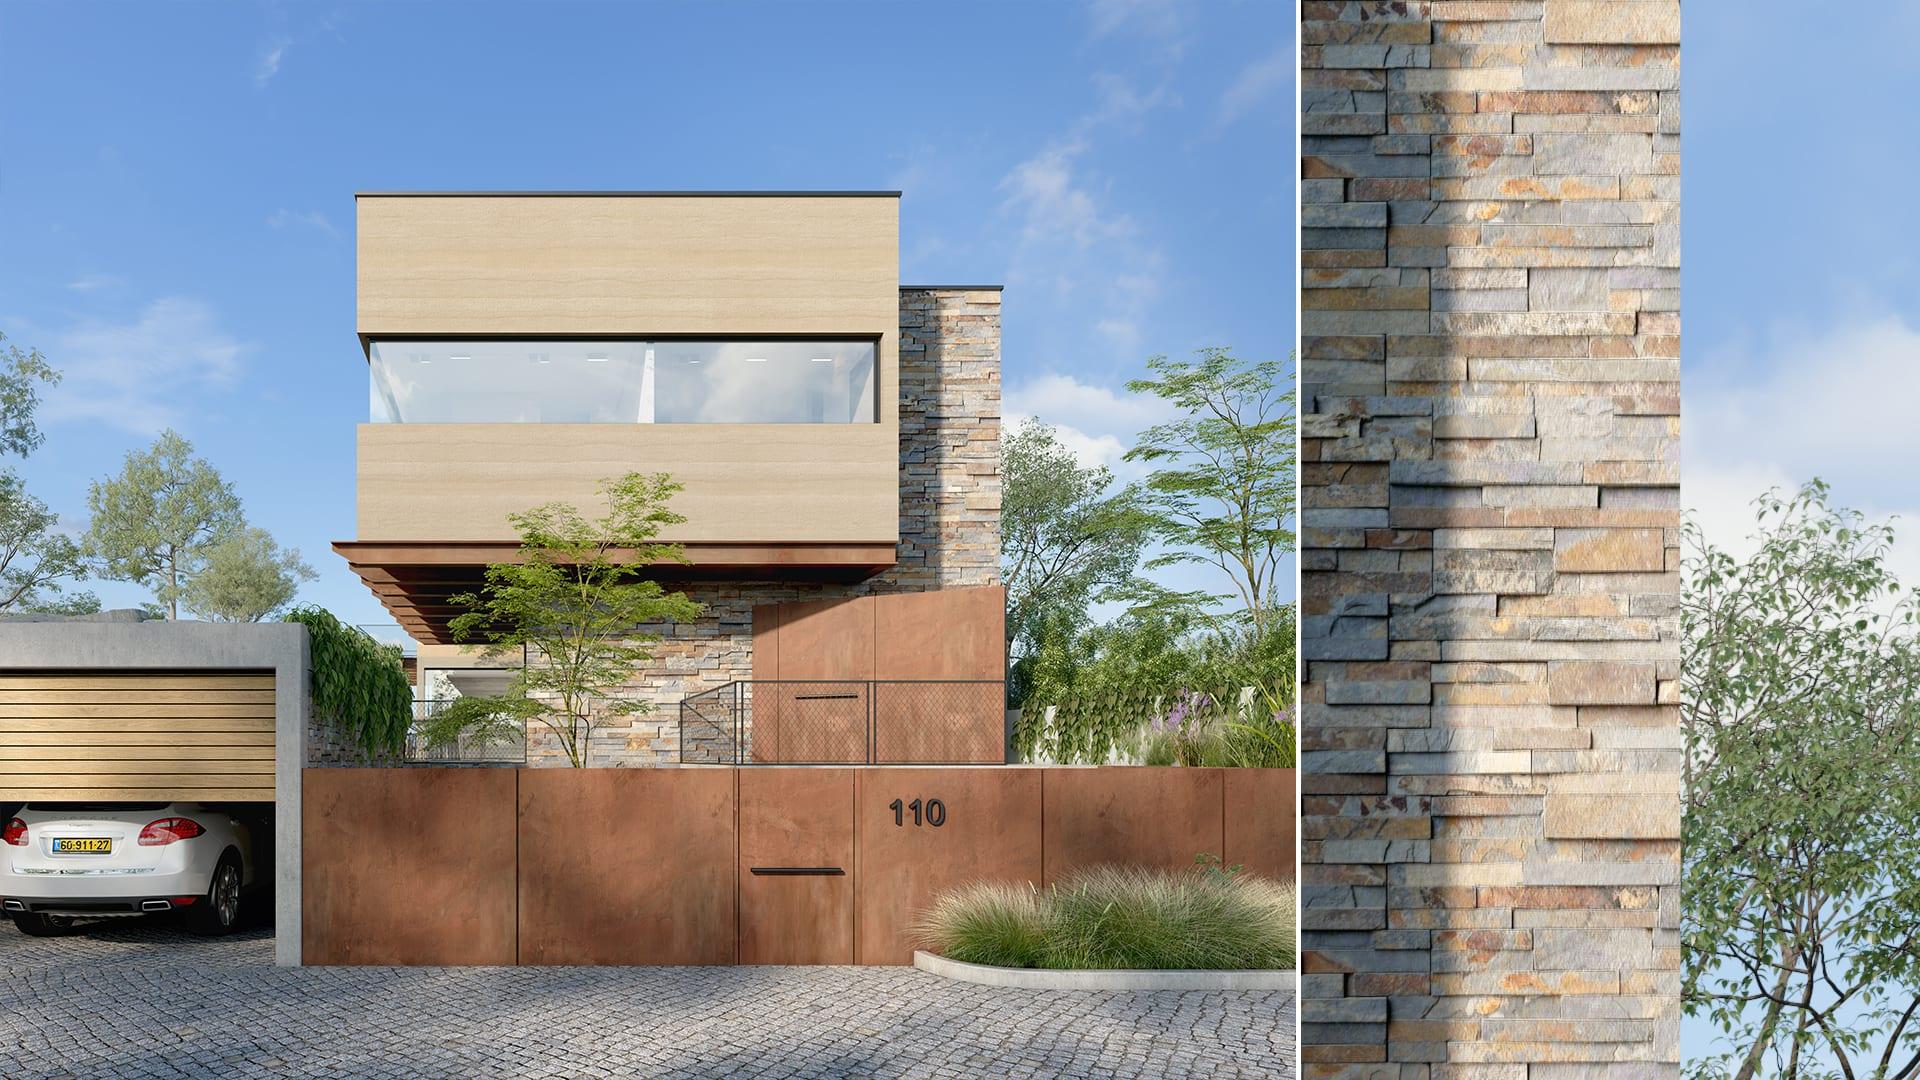 Maayan-Golan_Architectural-Visualization_G-house-exterior-visualization_front-elevation_architecture-yulie-wollman_02